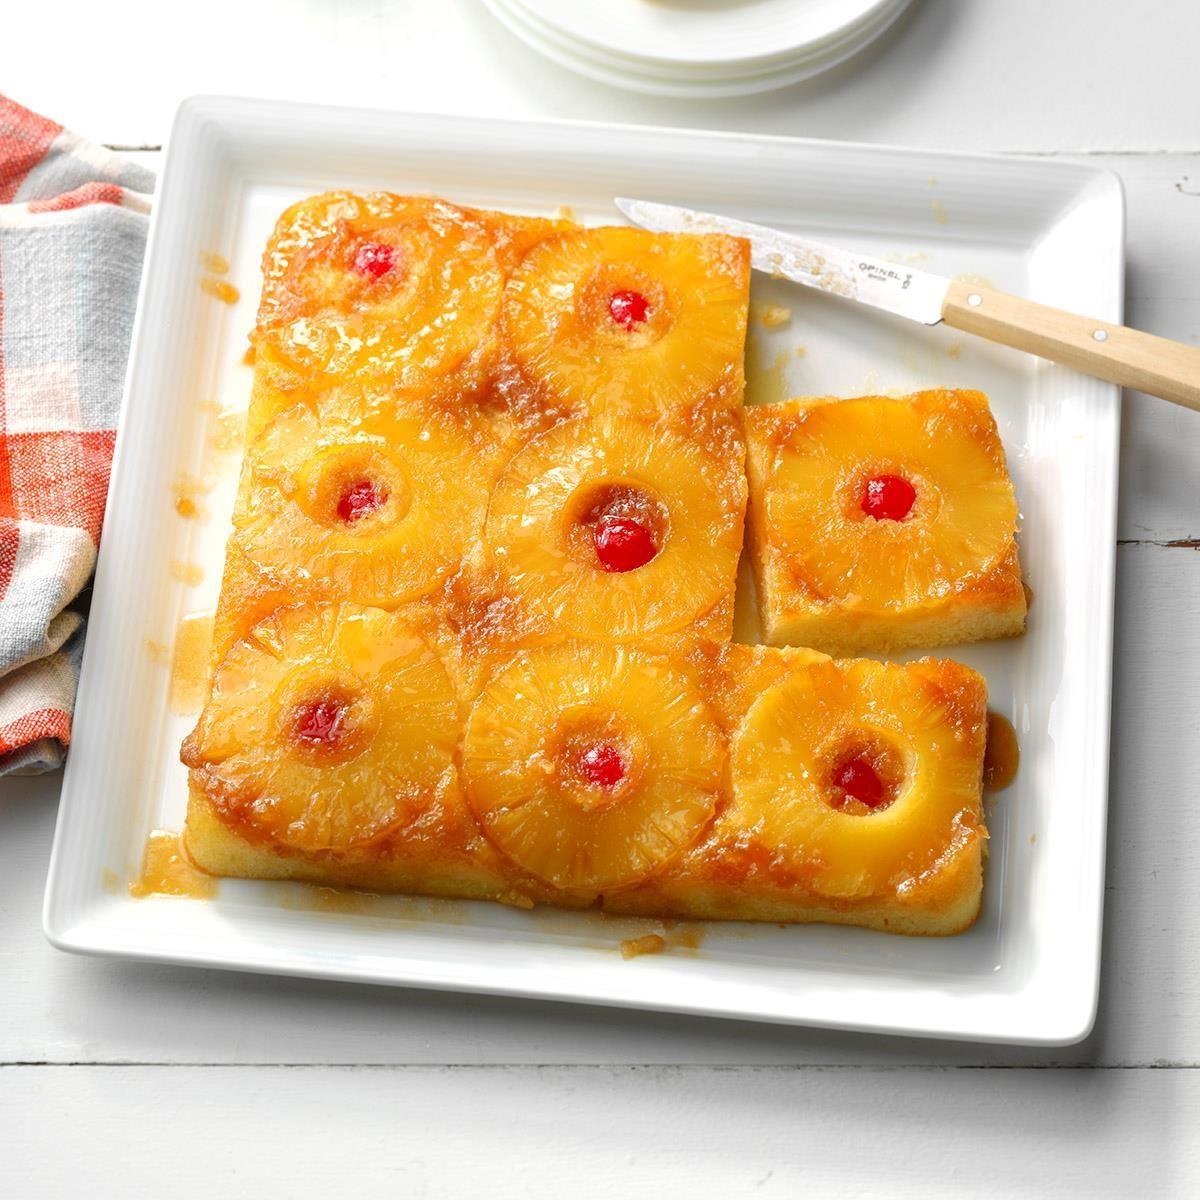 Makeover Pineapple Upside-Down Cake Recipe